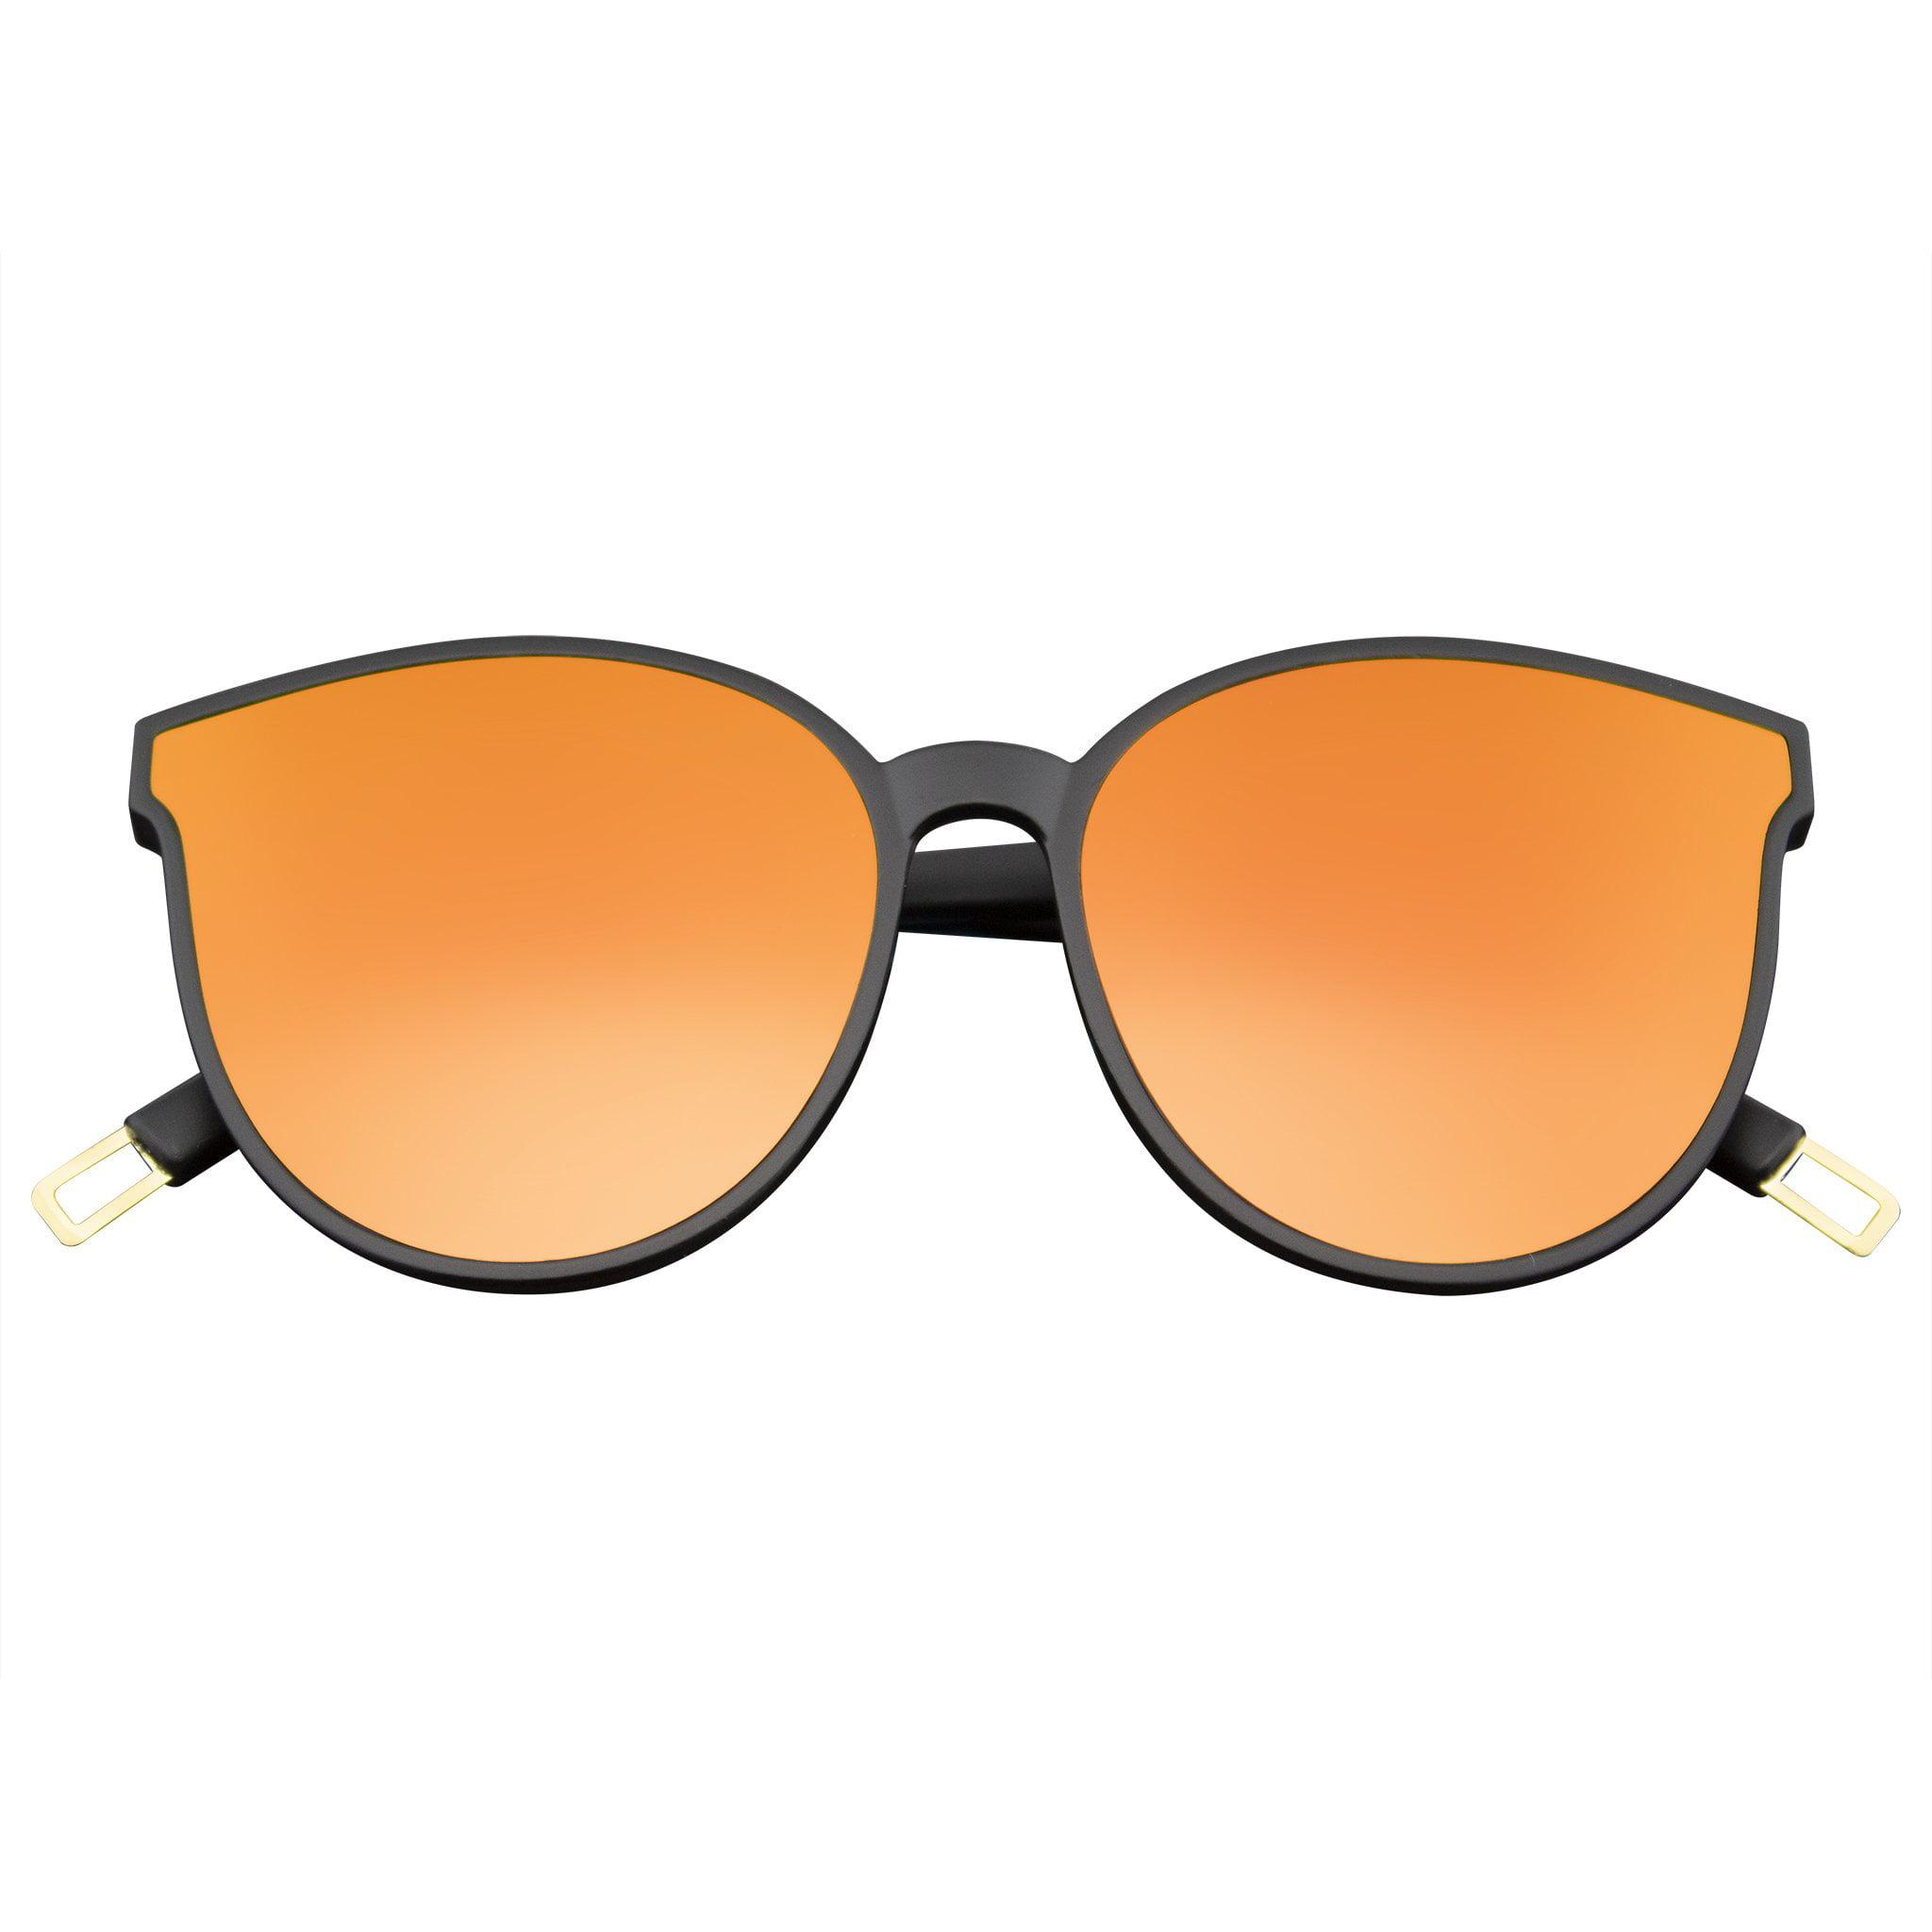 Mens Womens Retro Modern Horned Rim Mirrored Flat Infinity Lens Sunglasses